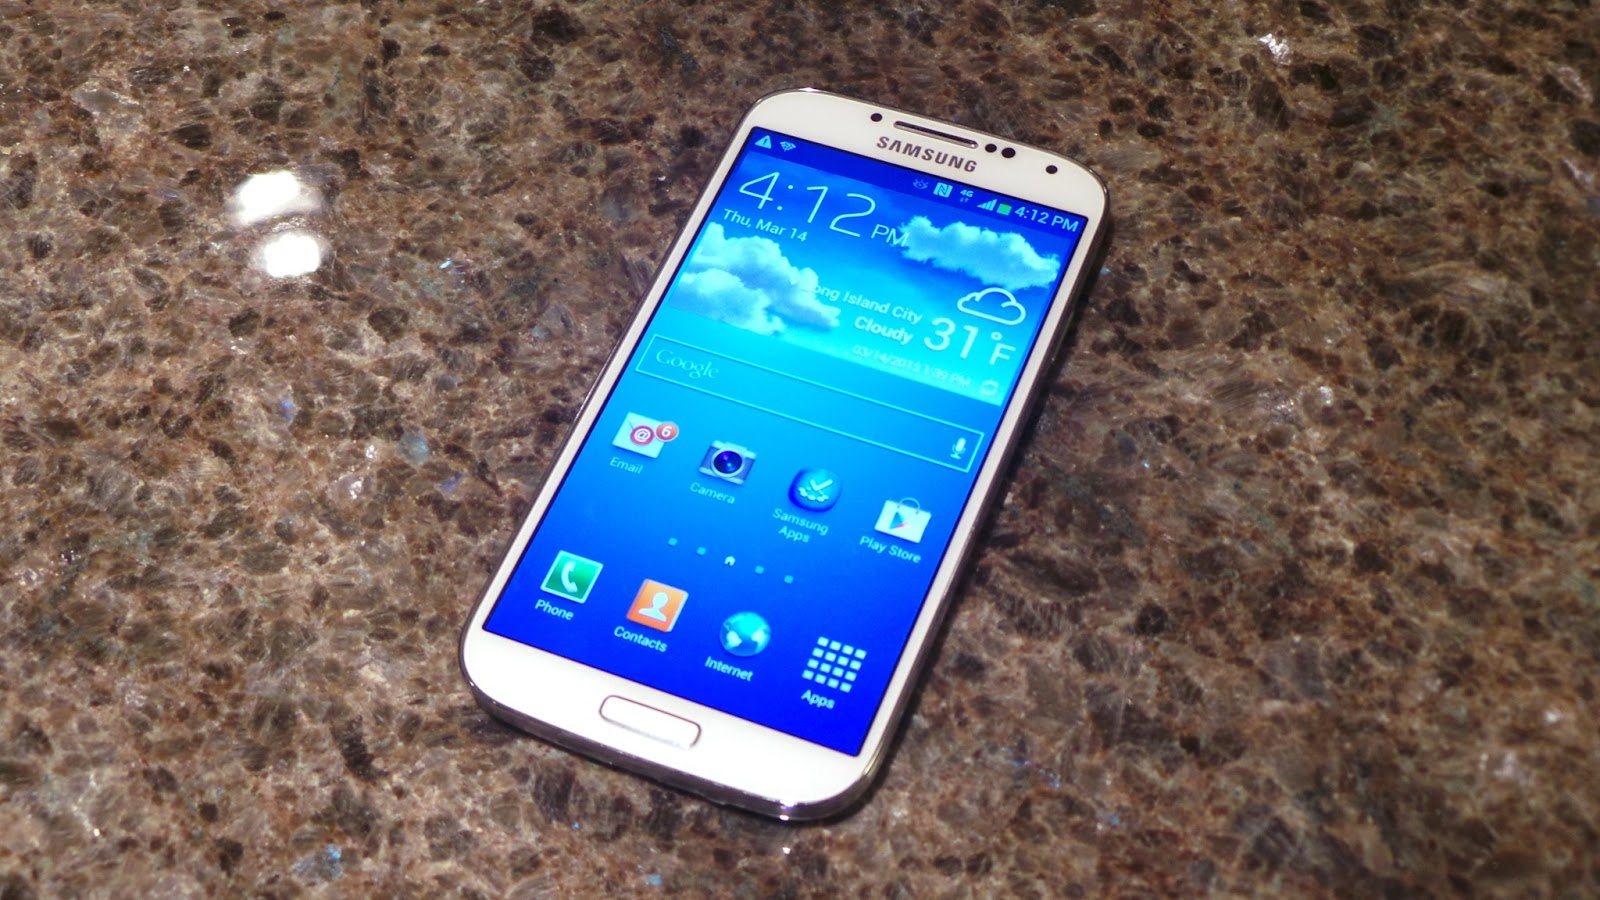 Samsung Galaxy S4 Wallpapers Hd: Samsung Galaxy S4 Wallpapers HD